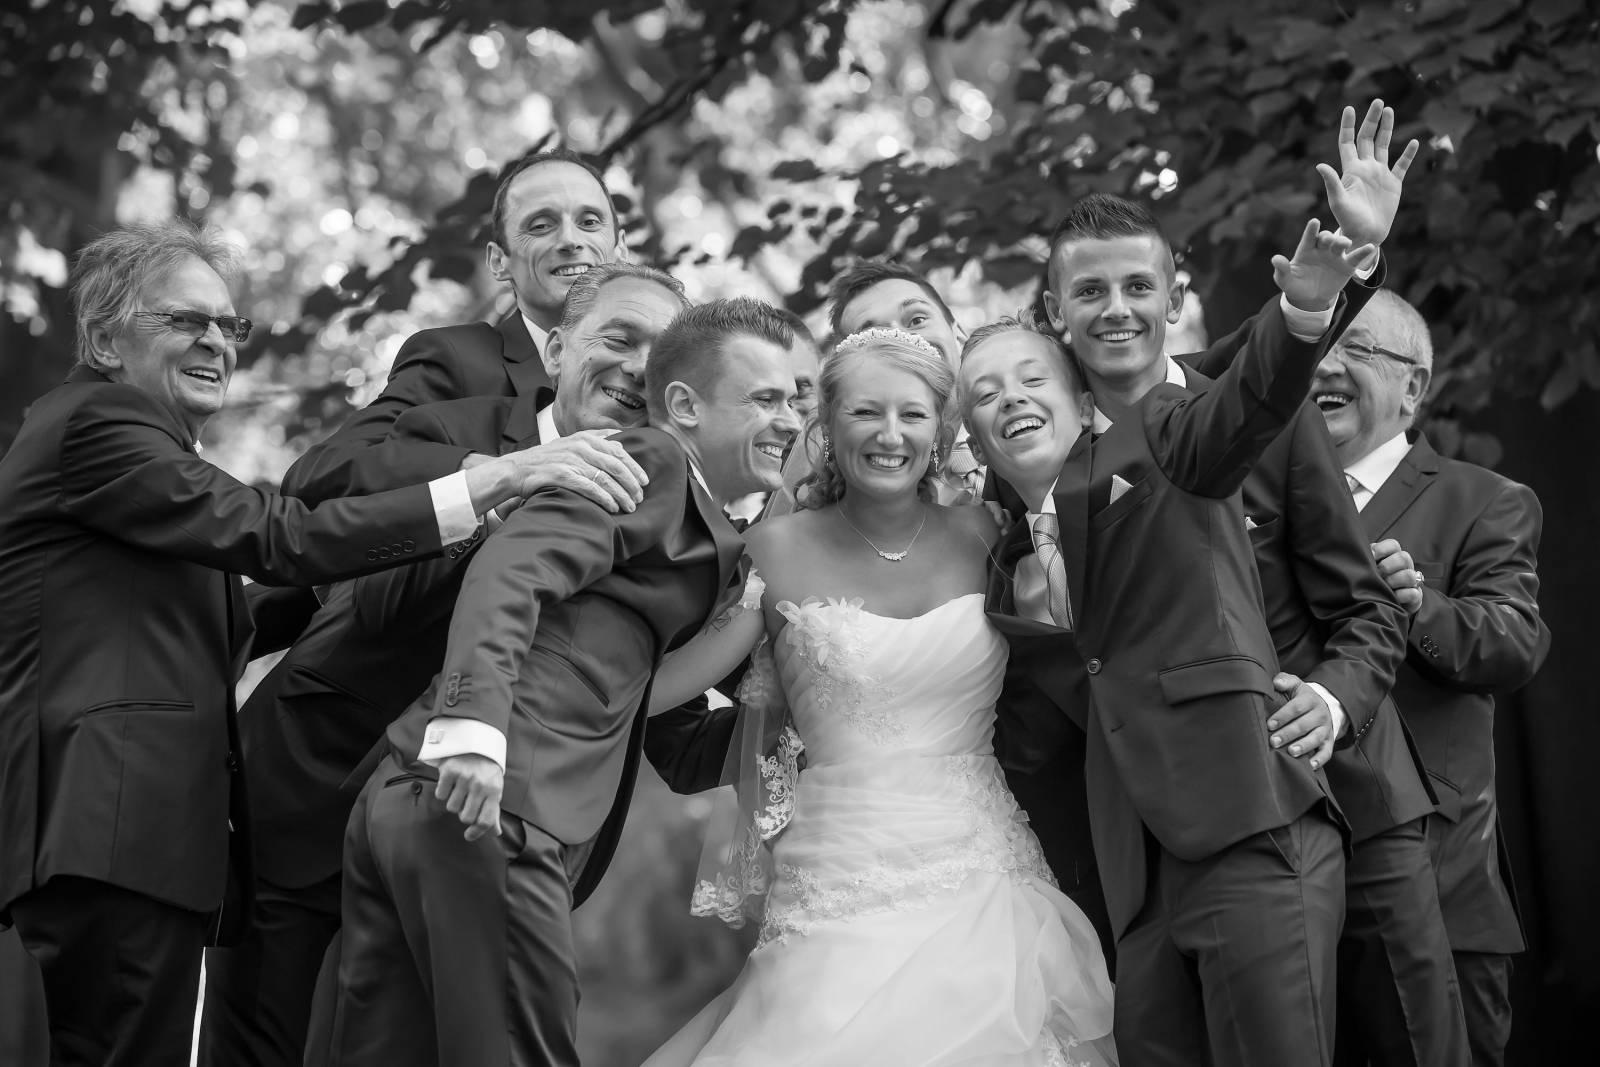 Foto Meeuw - House of Weddings - 23